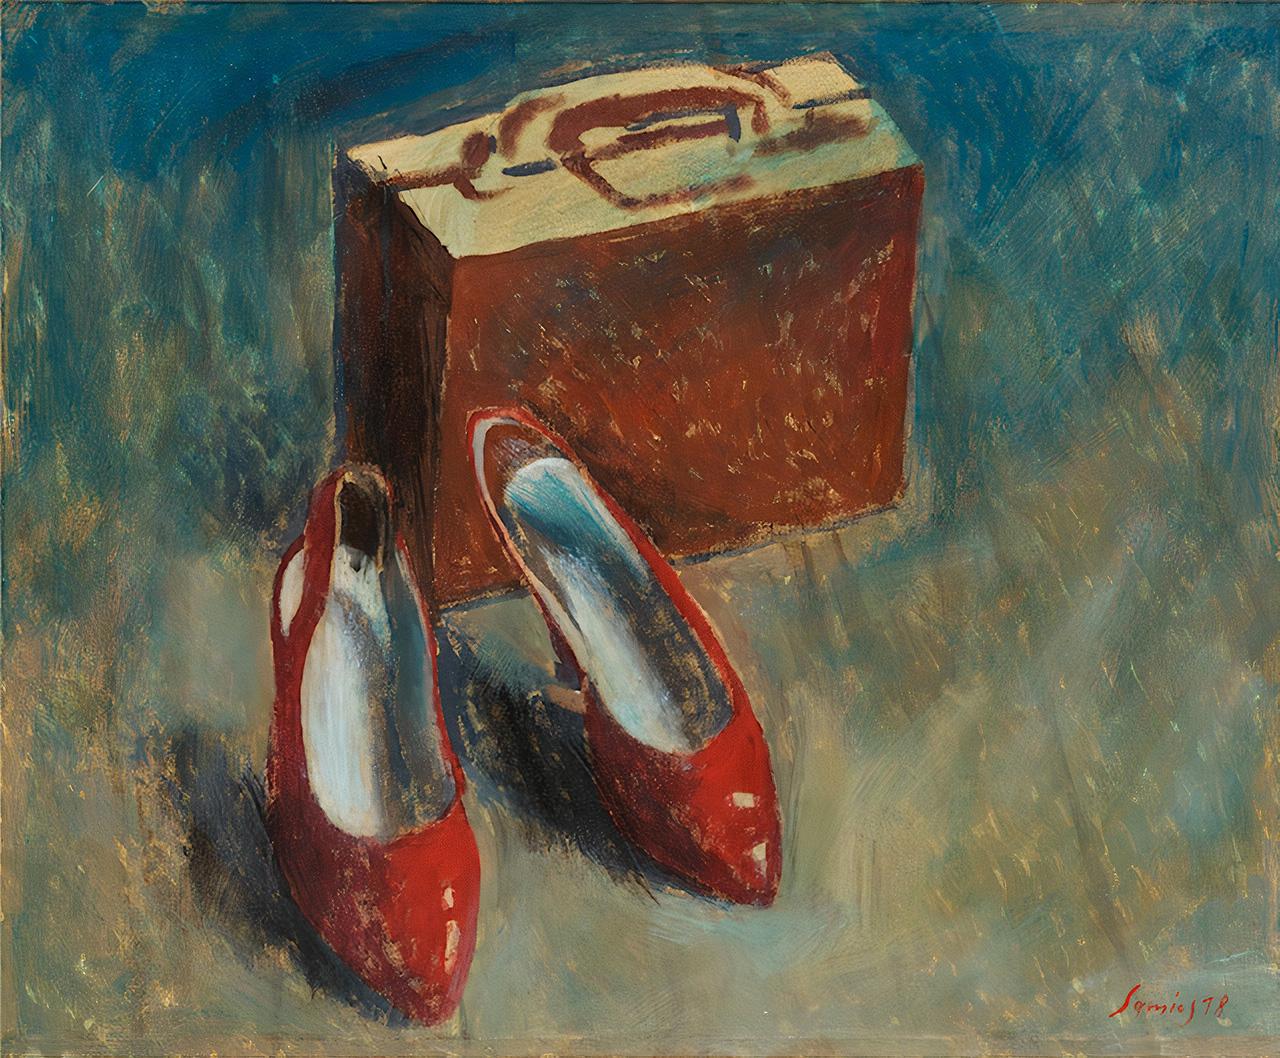 The Suitcase, acrylics on canvas, 45x45 cm